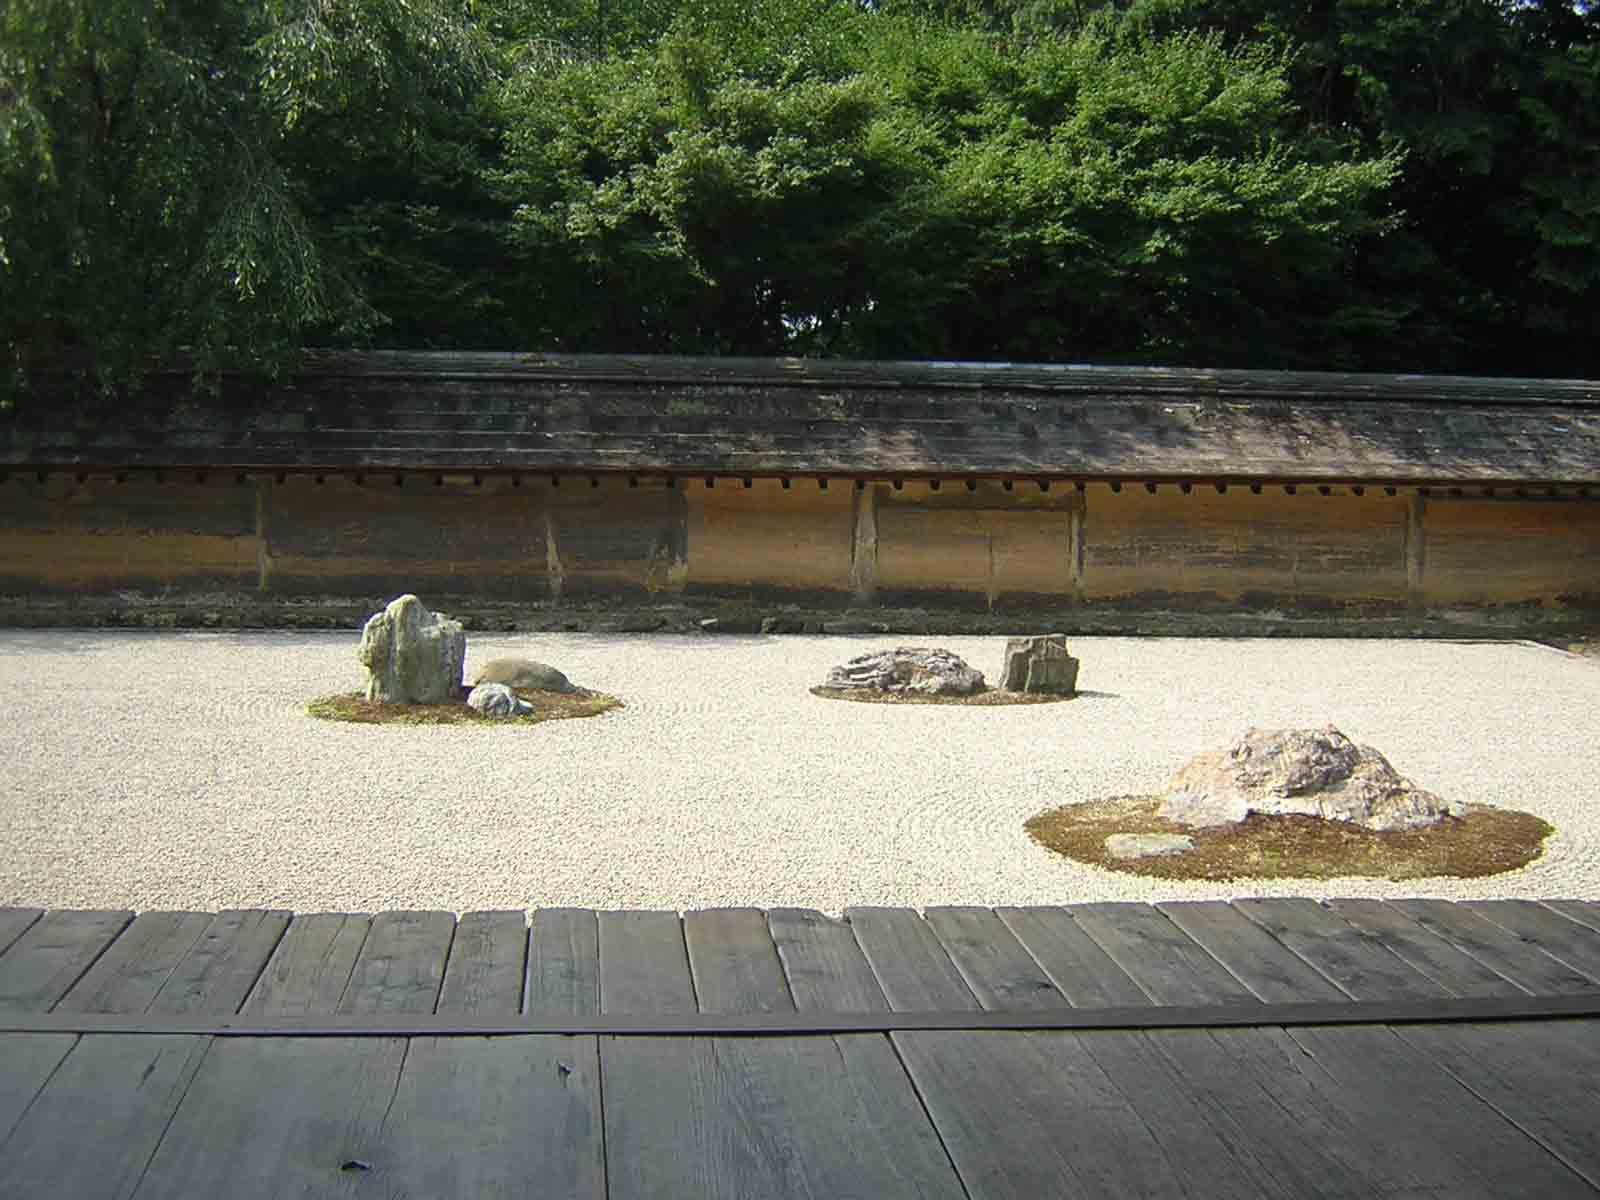 jardin ryoanji 14 15 rocas grupos